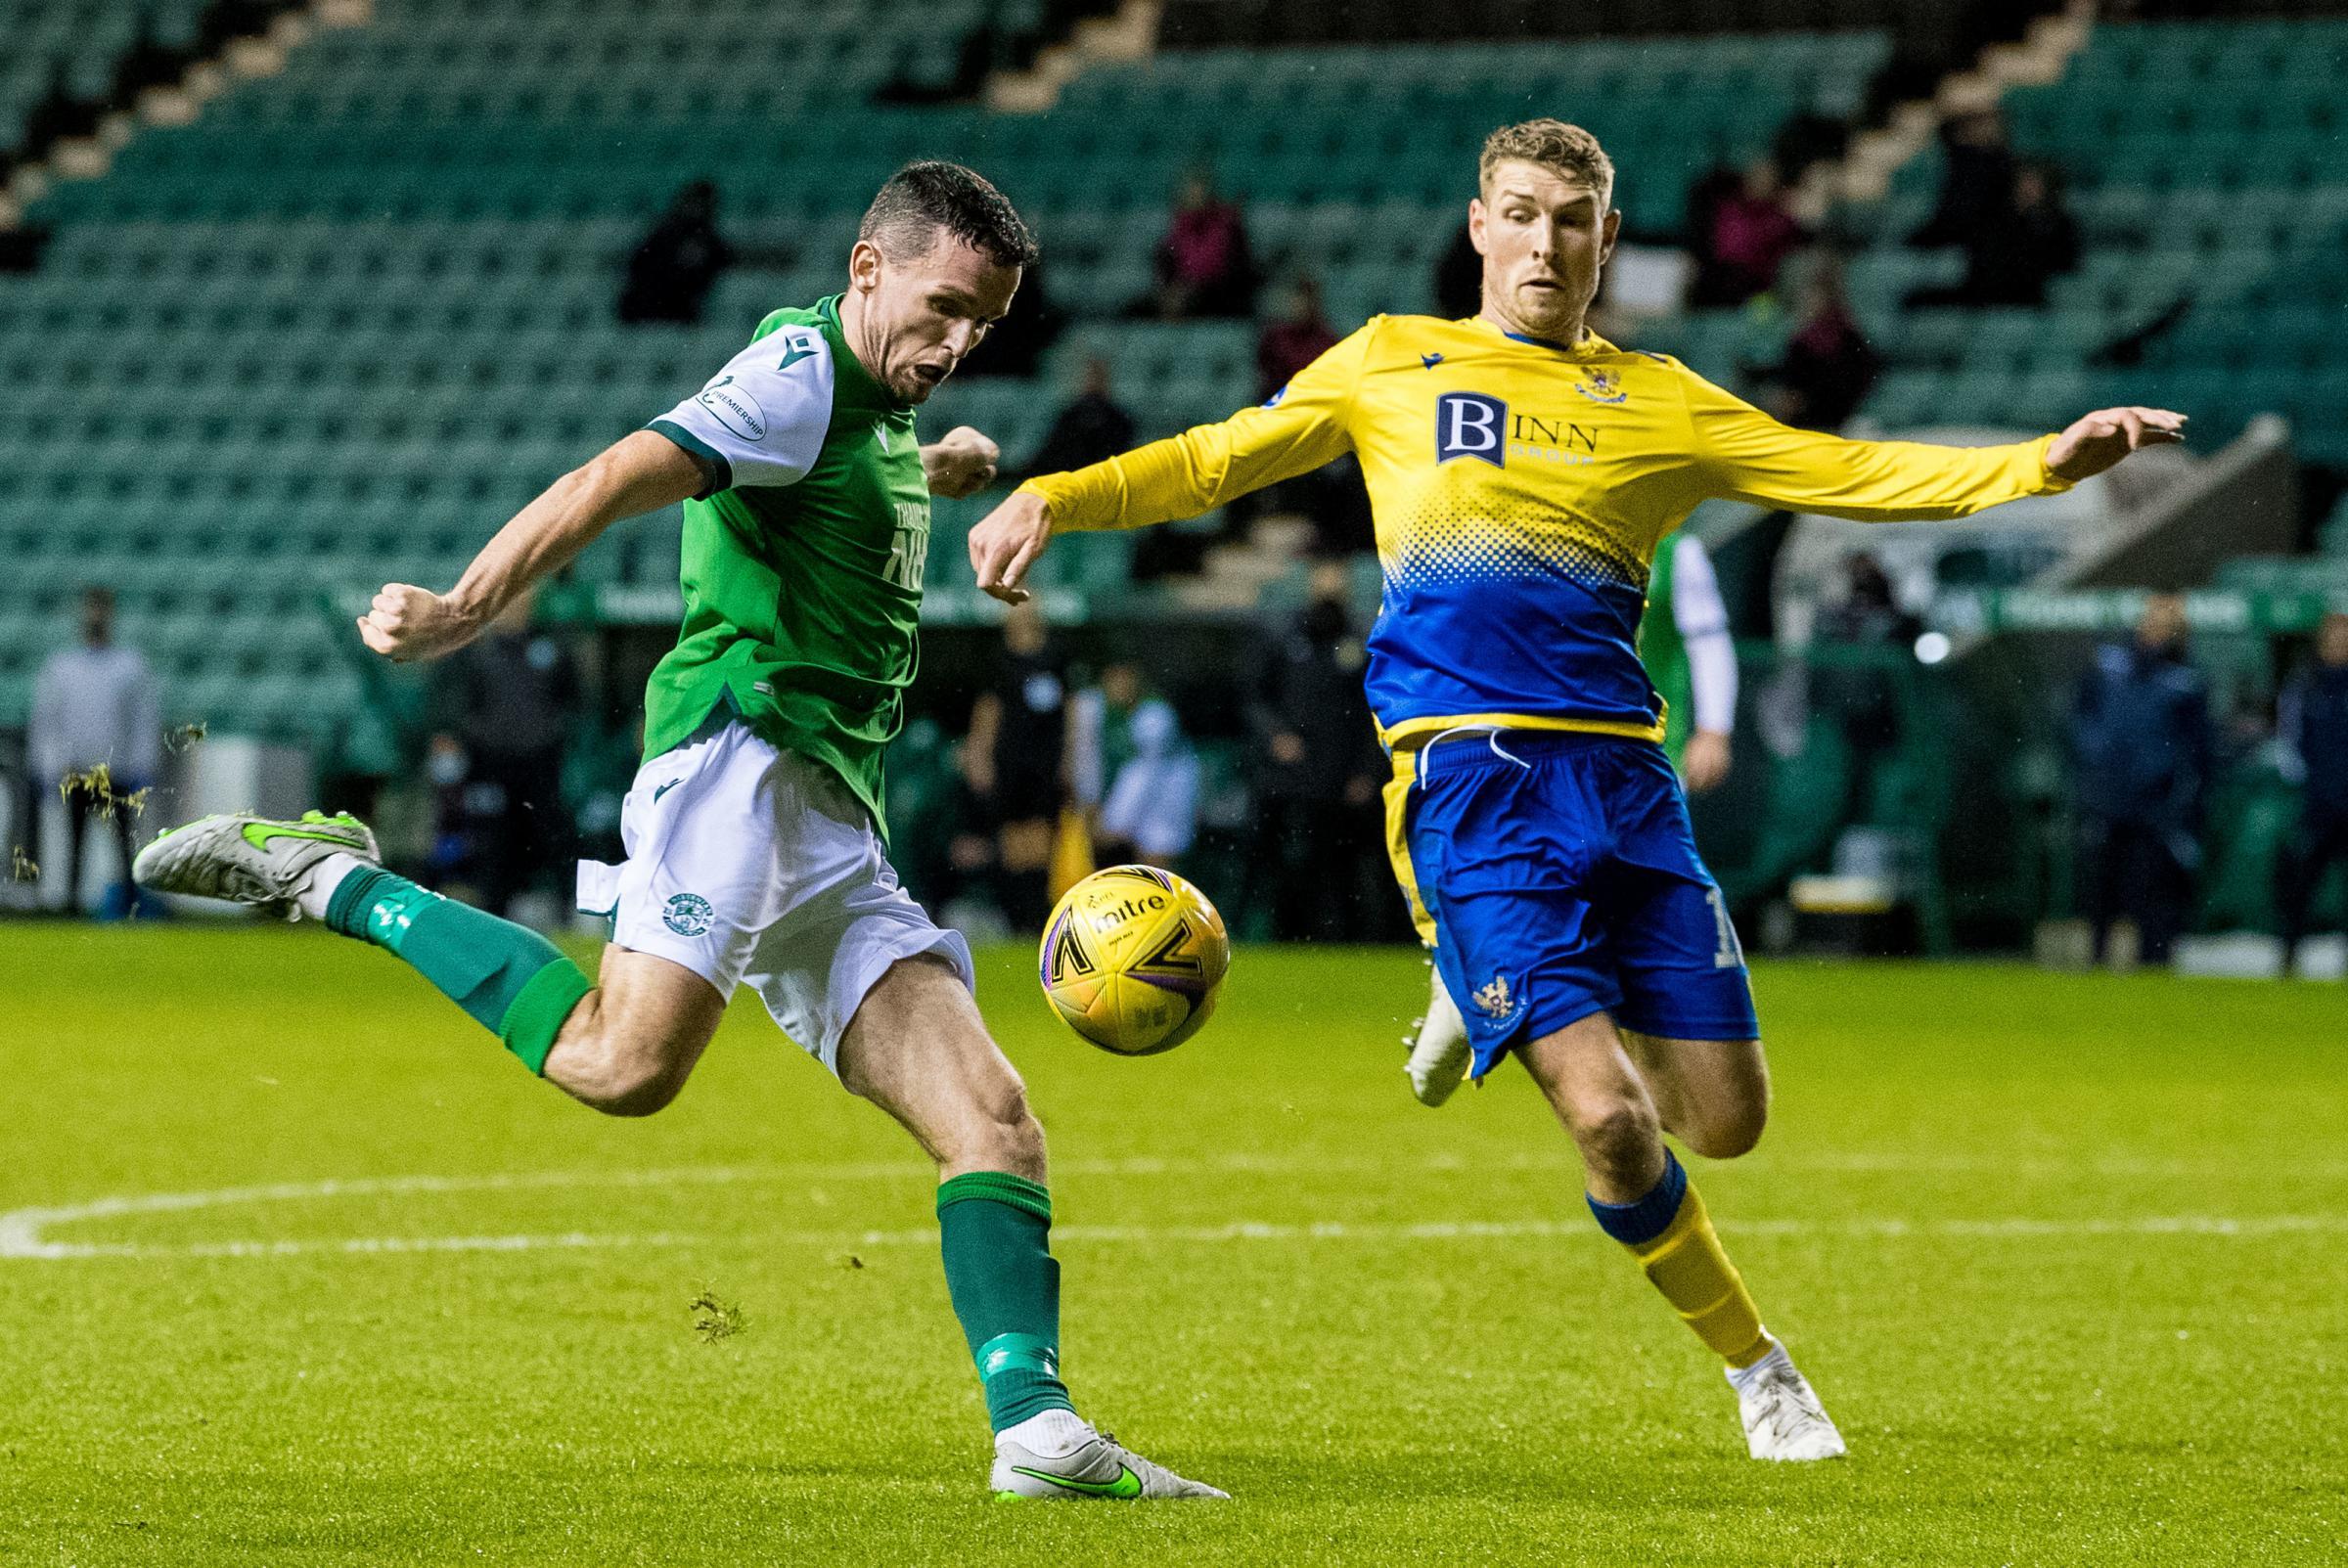 Hibs 2 St Johnstone 2: Jack Ross hails Paul McGinn after brace